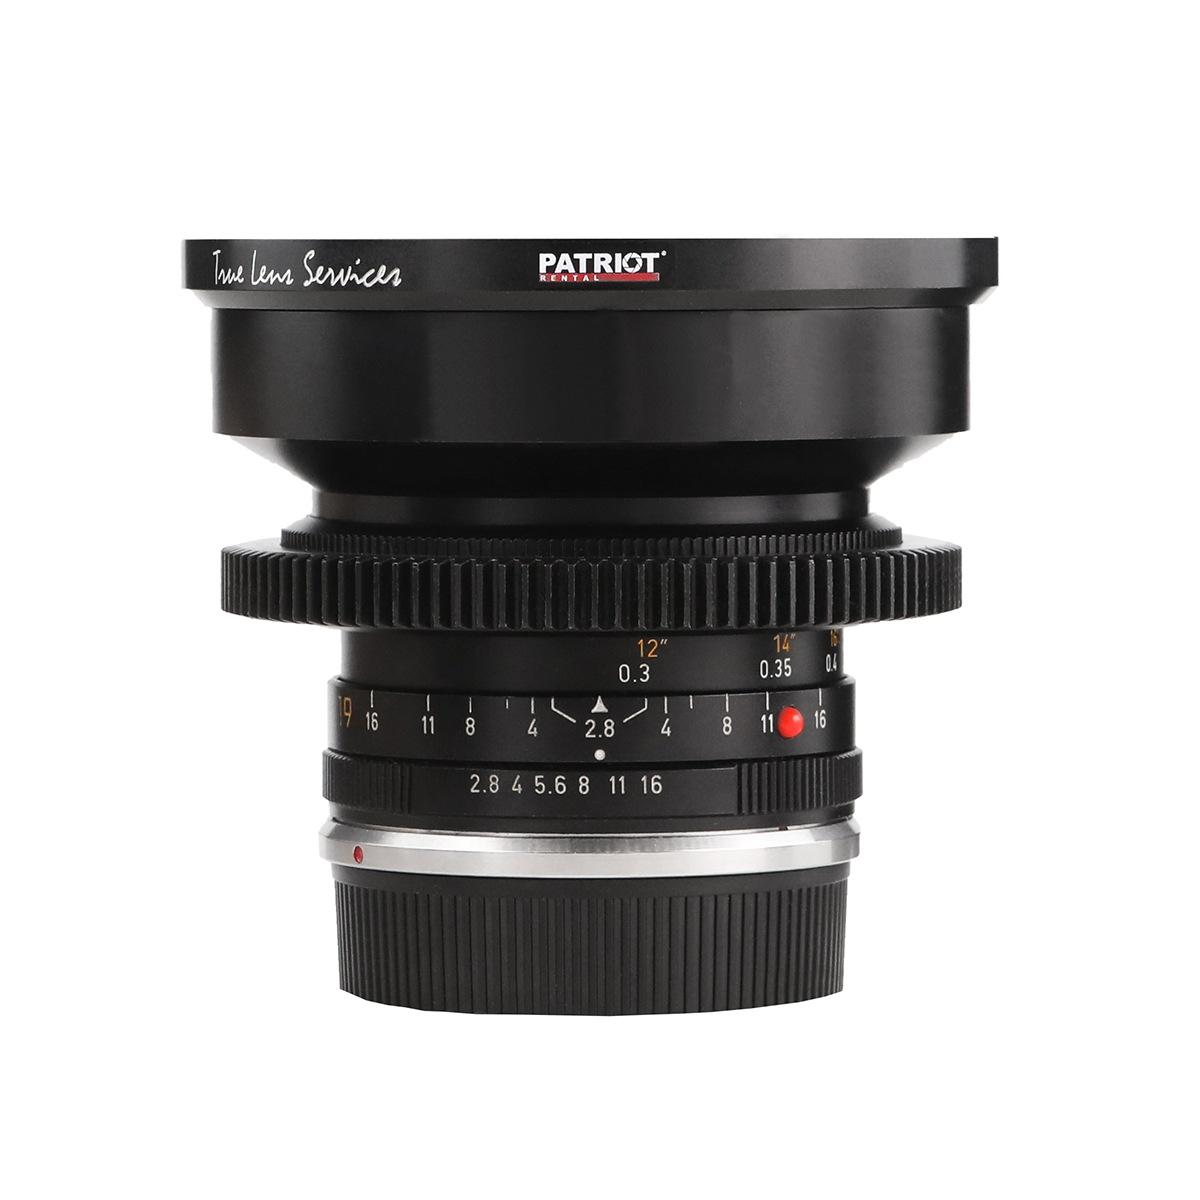 19mm LEICA-R EF Lens T2.8